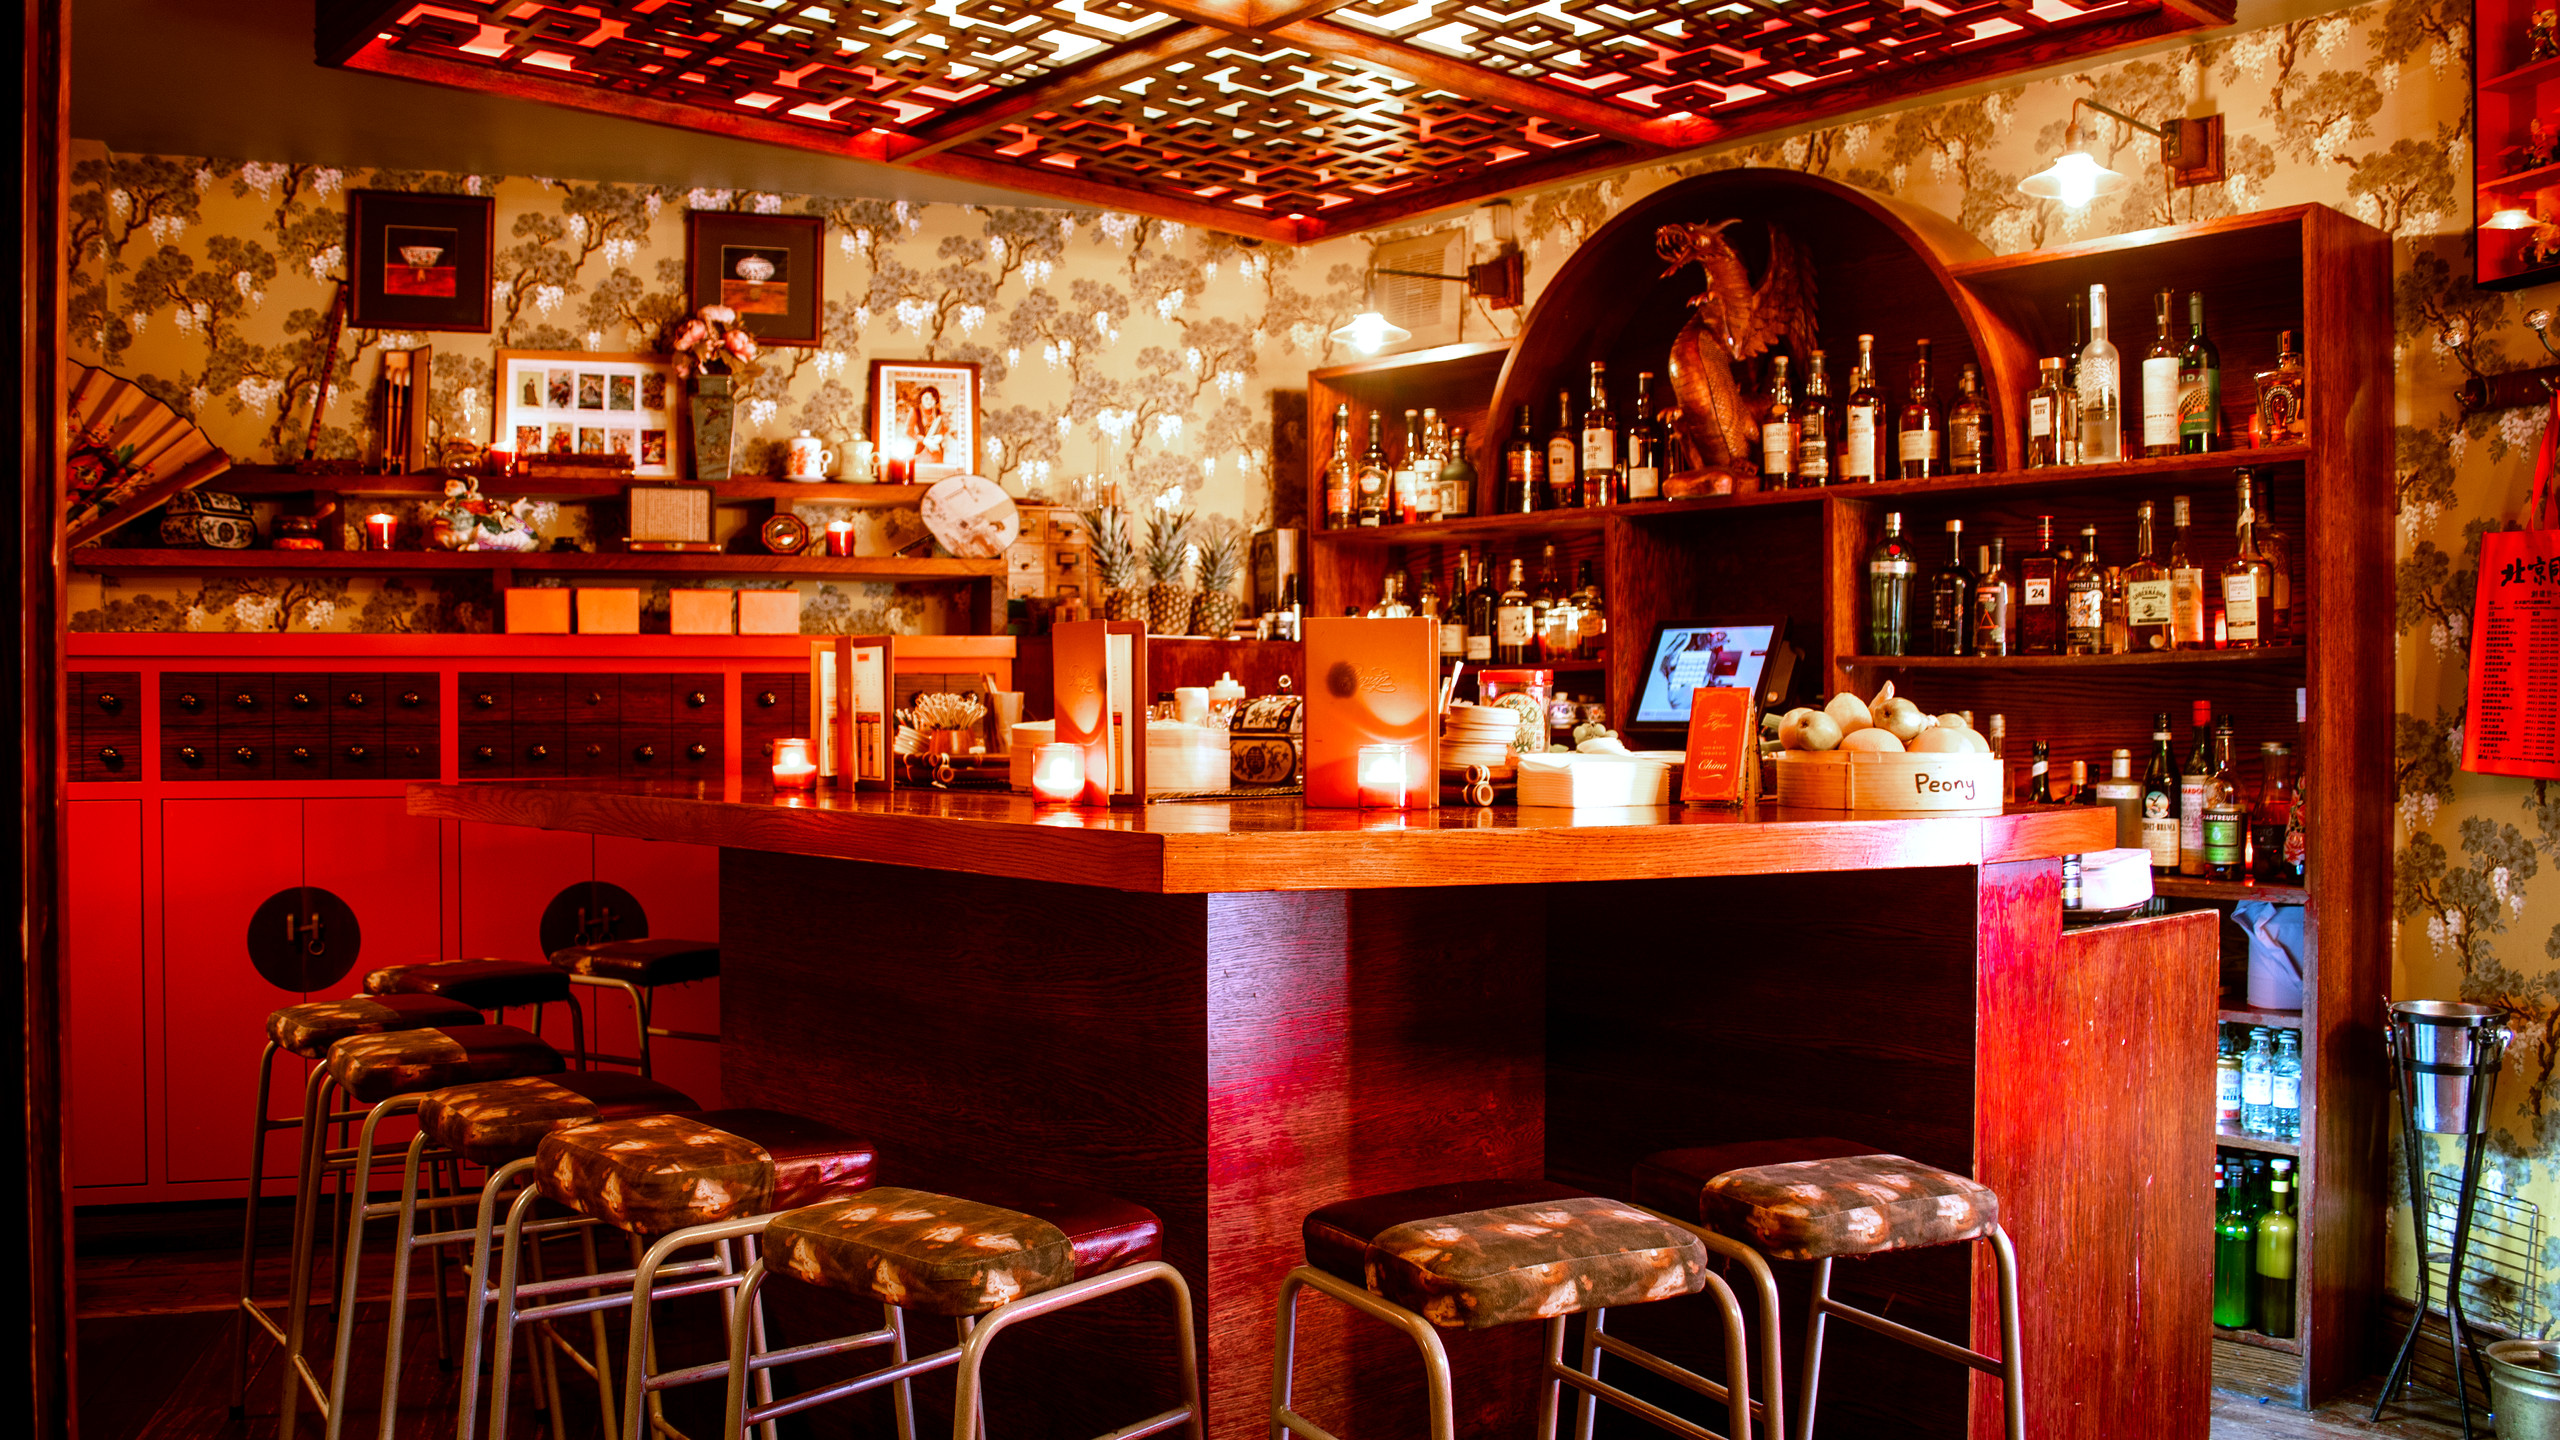 The beautiful bar